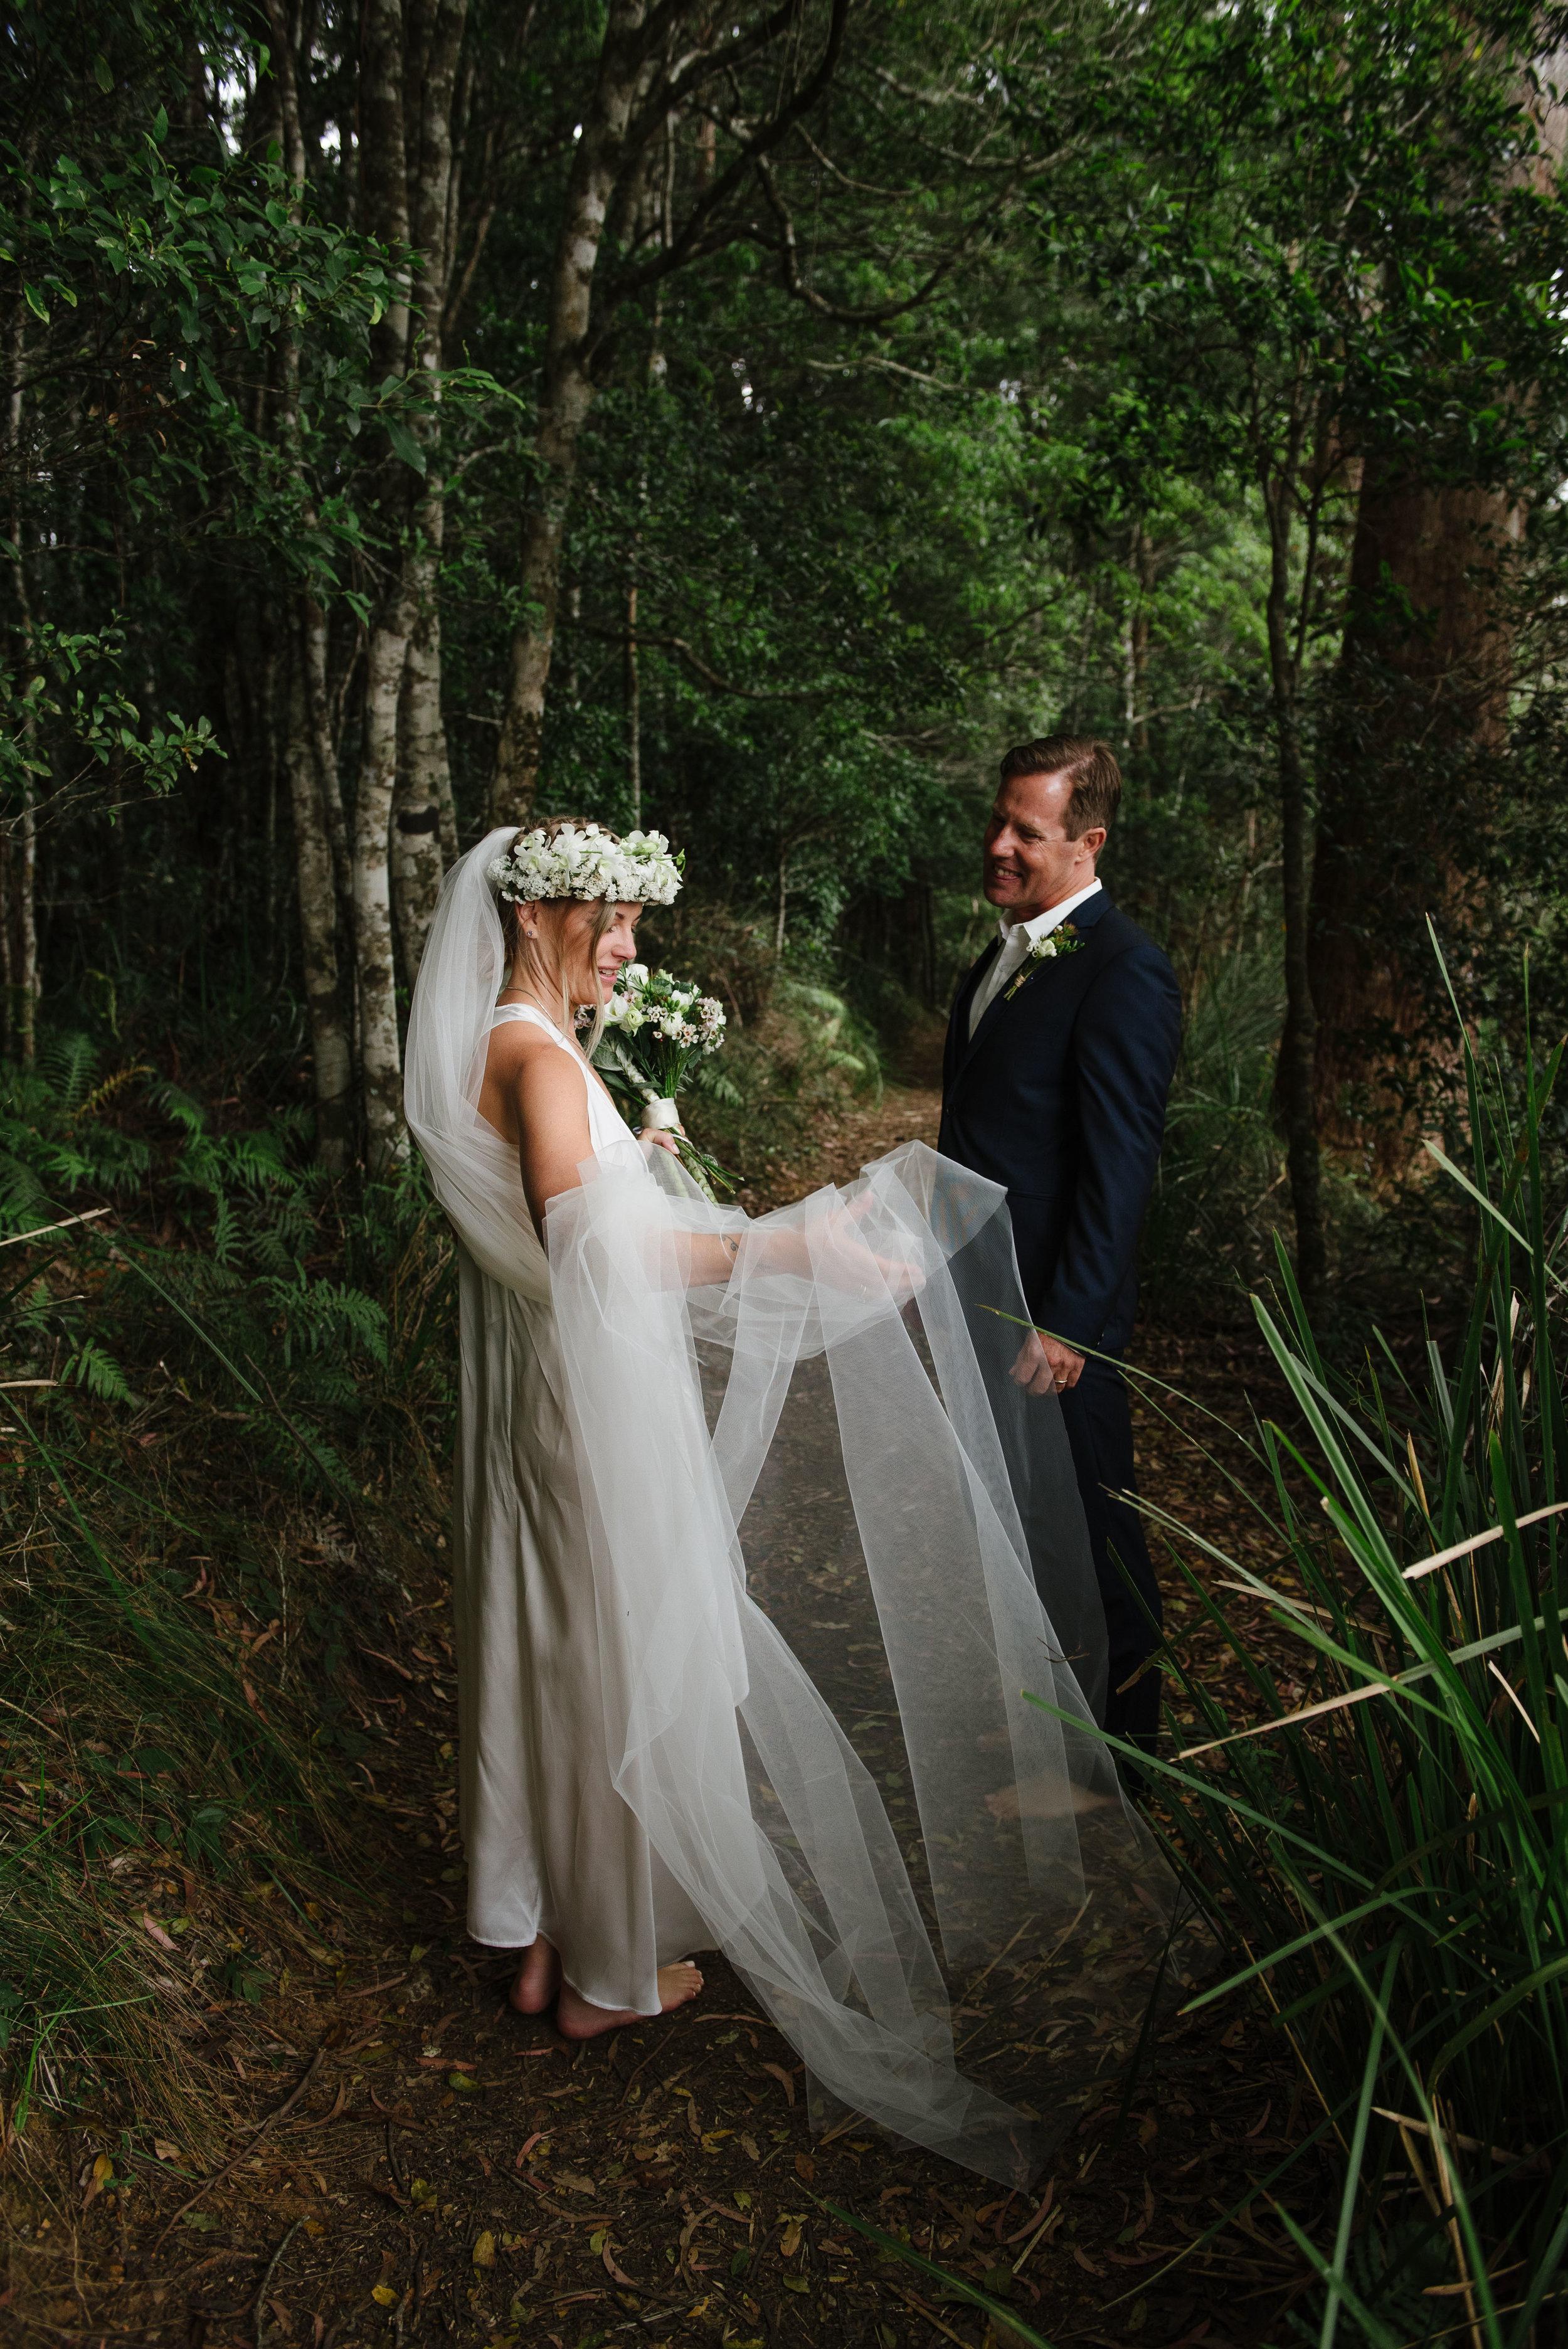 Carla and Luke- wedding photographer, byron bay wedding and family photographer, tweed heads wedding and family photography-212.jpg